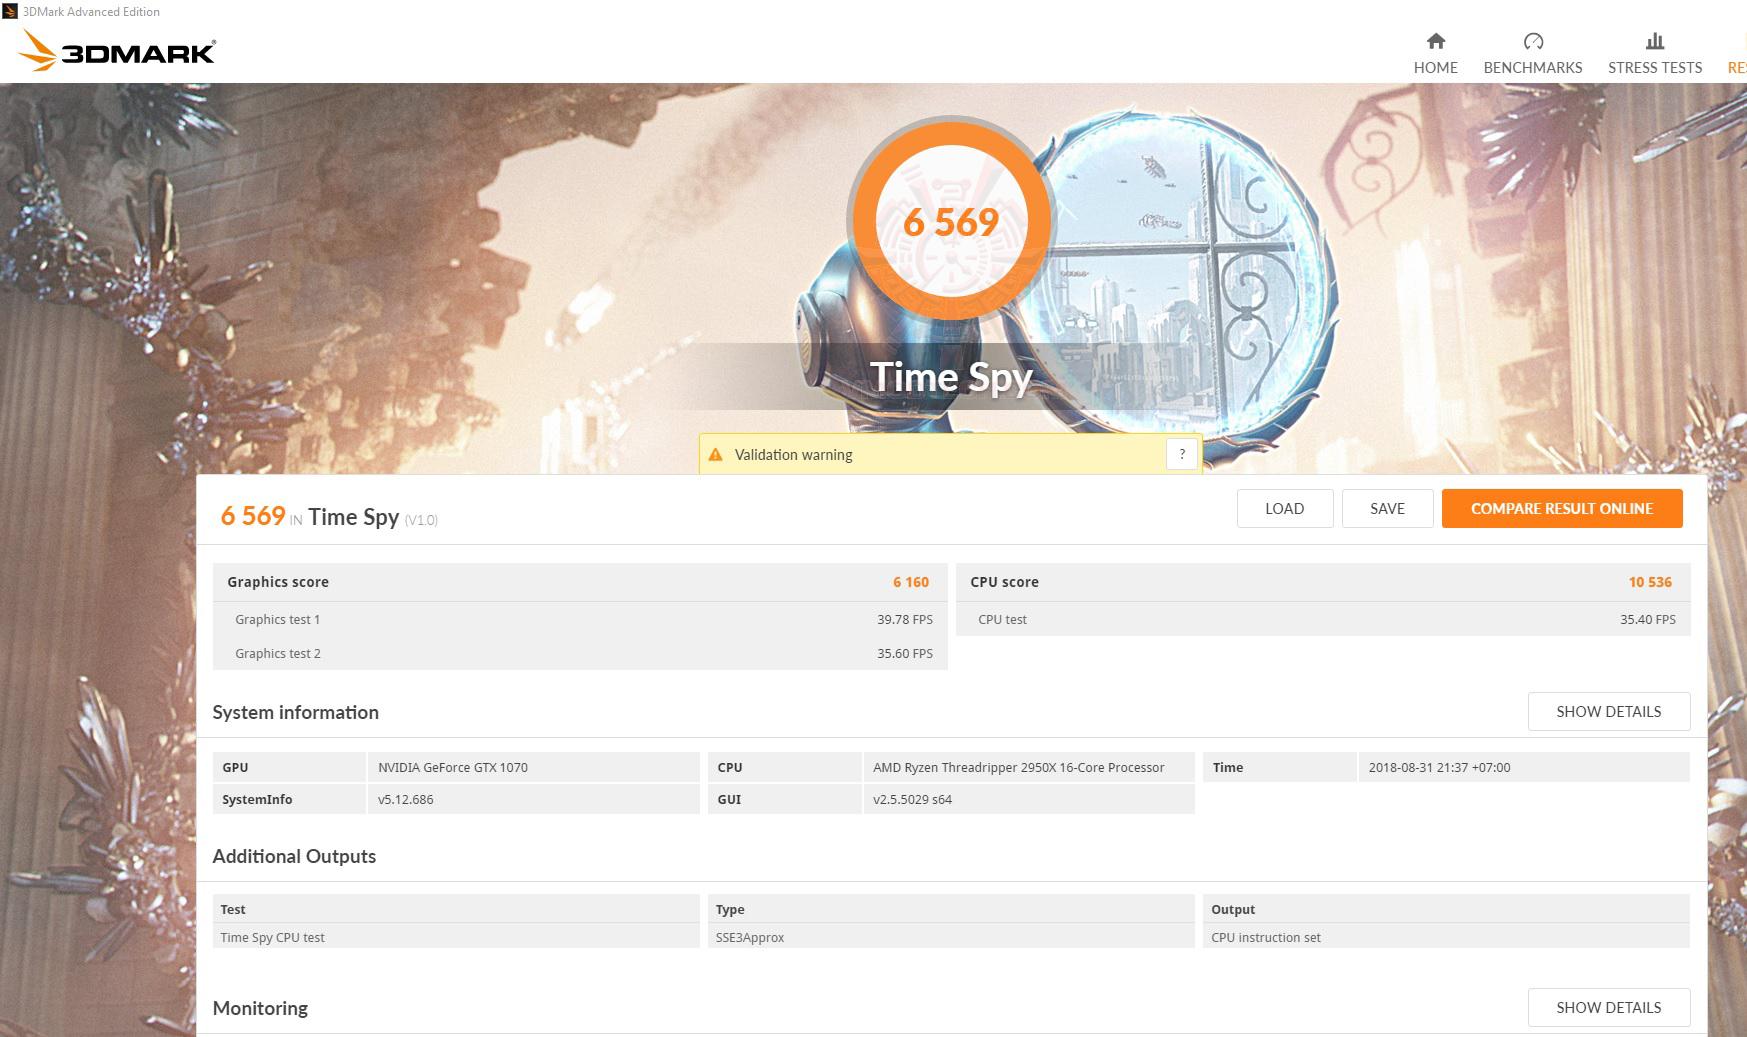 spy AMD RYZEN THREADRIPPER 2950X PROCESSOR REVIEW